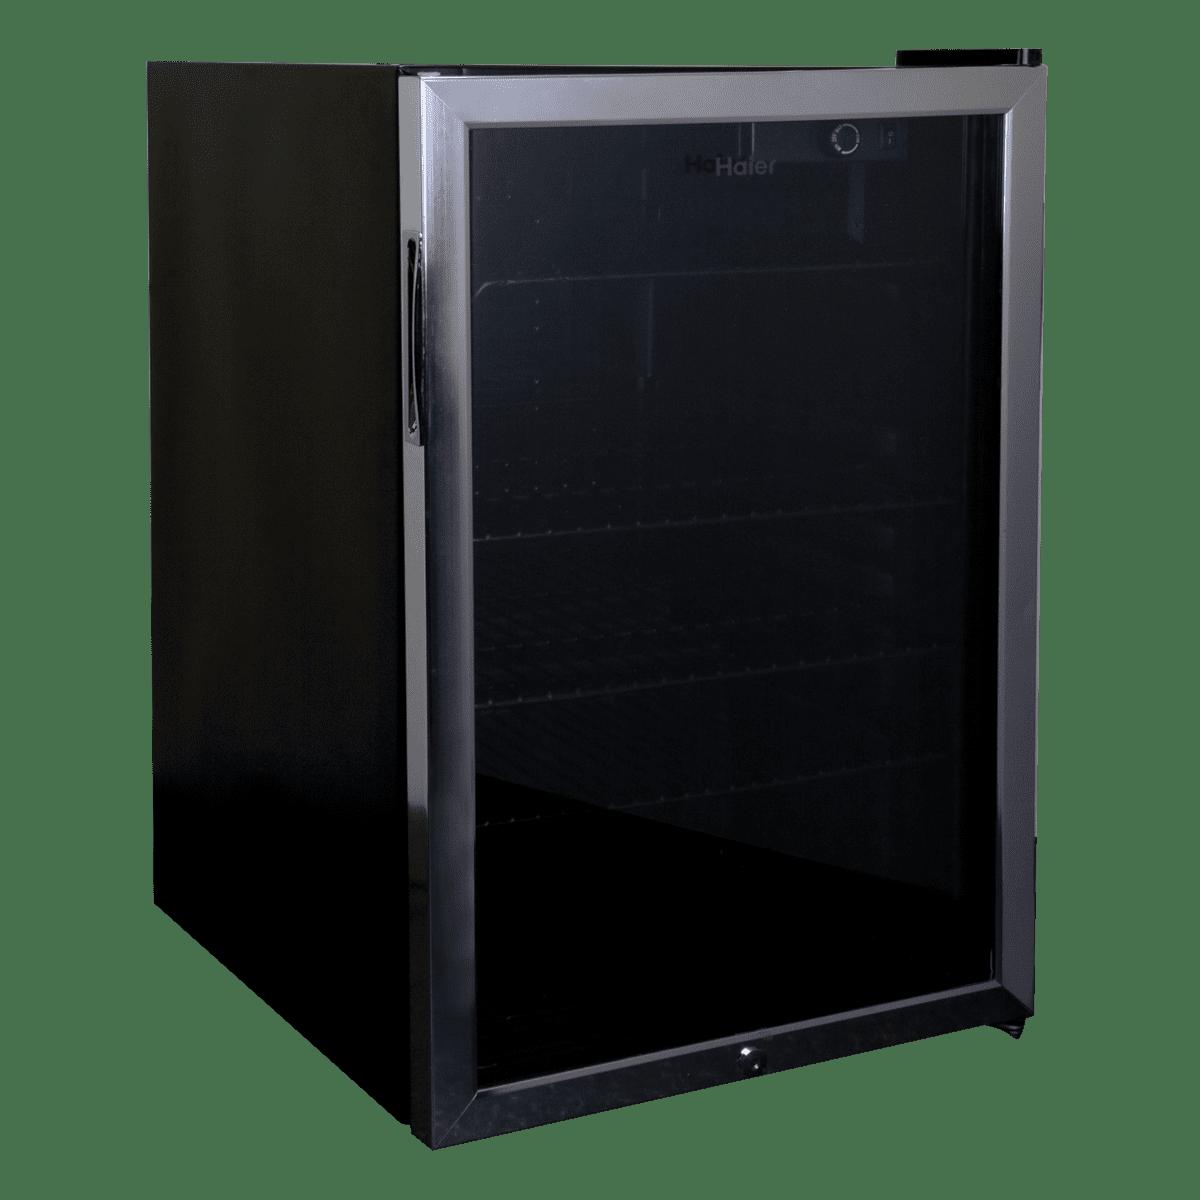 mini definition price pictures wallpaper door fridge resolution idea of high mesmerizing range glass